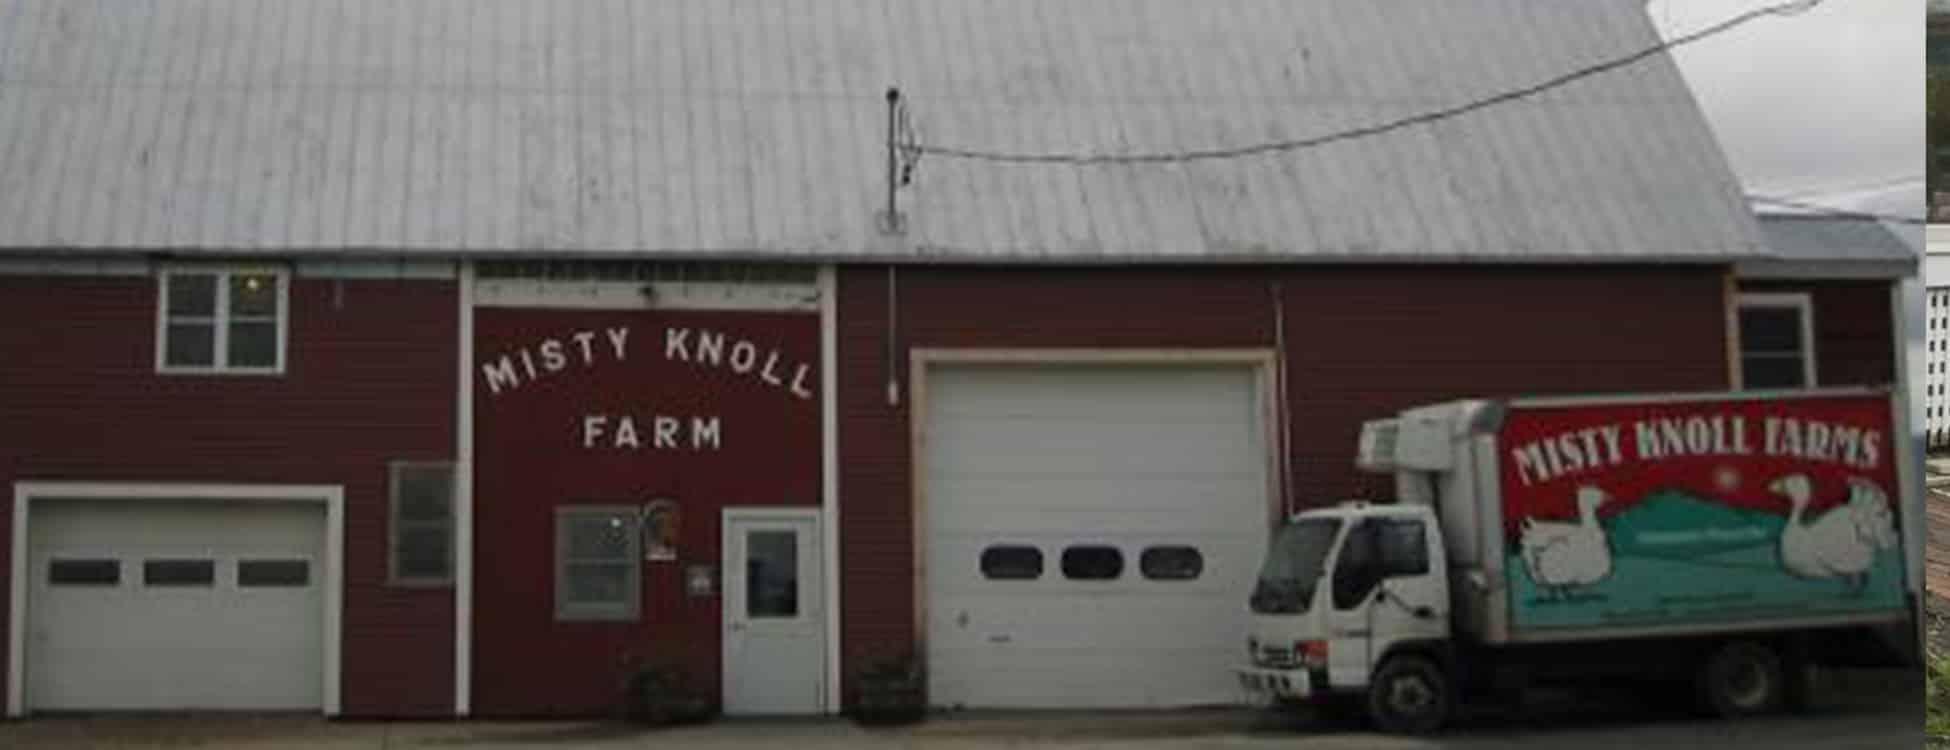 Misty Knoll Farm, alumnus John Palmer, entrepreneurship